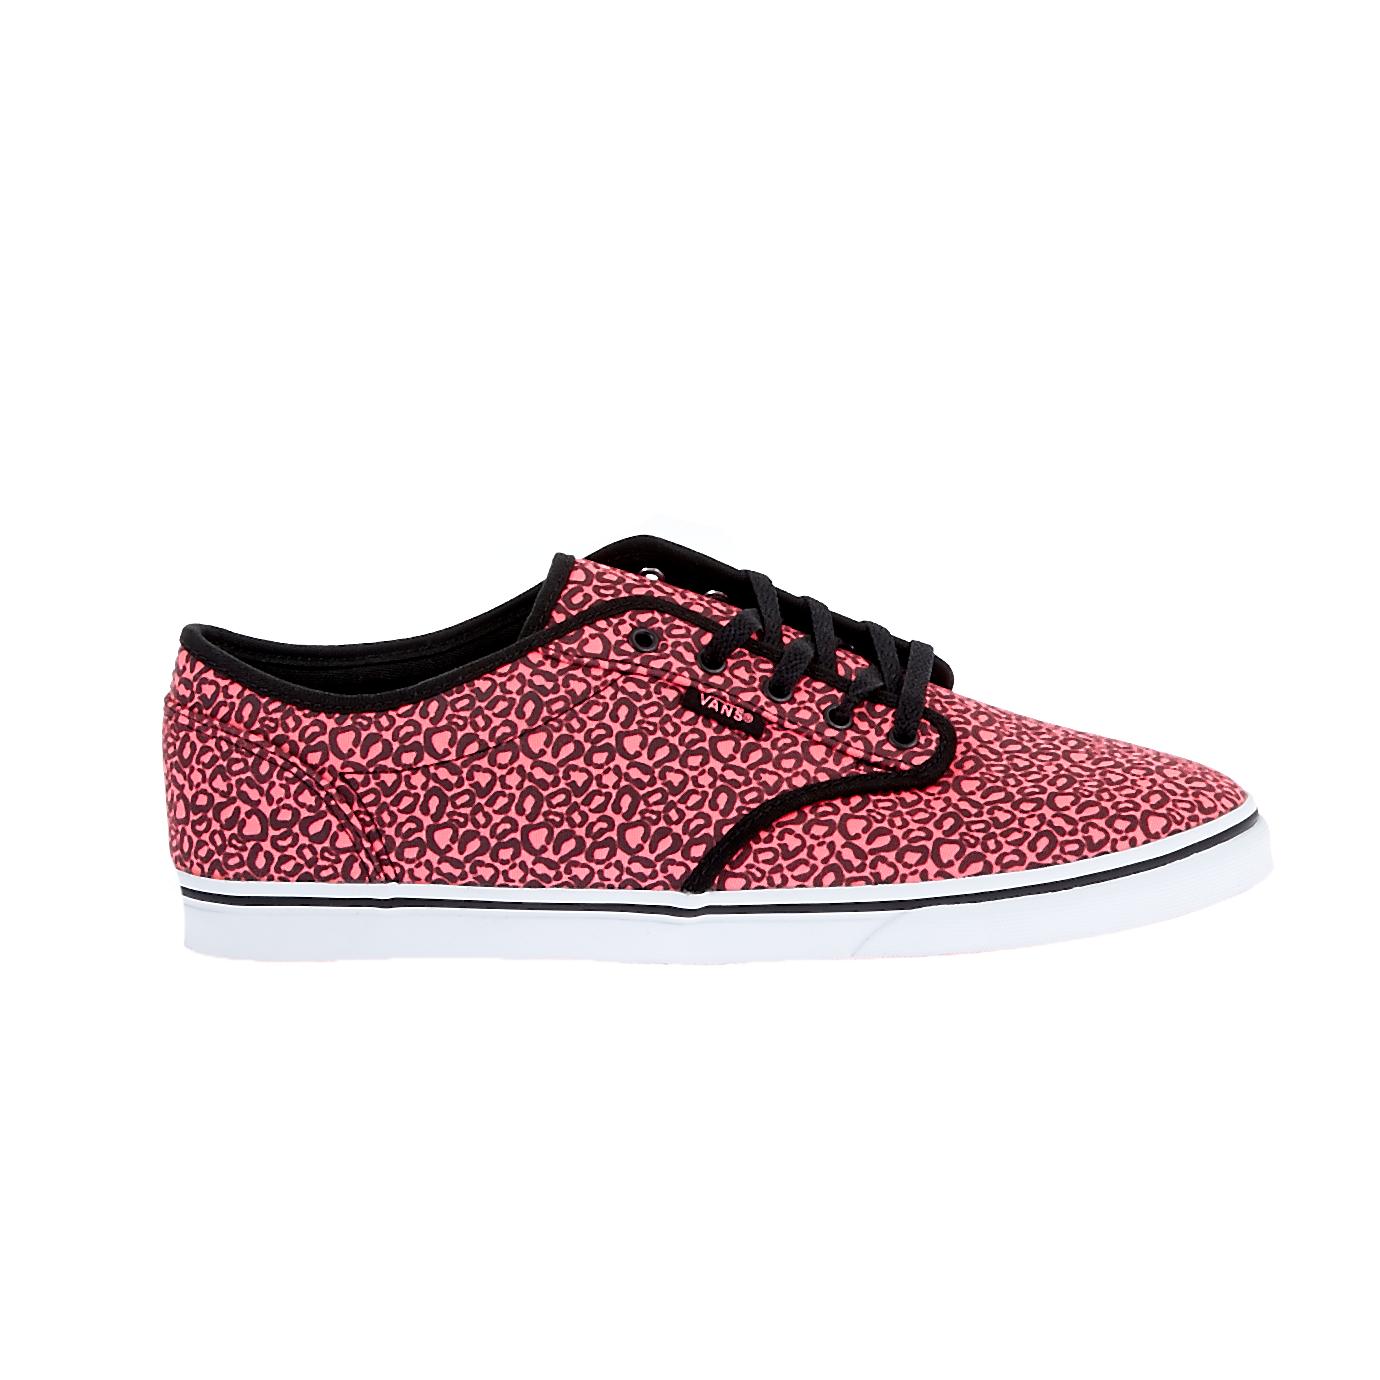 VANS - Γυναικεία παπούτσια VANS φούξια